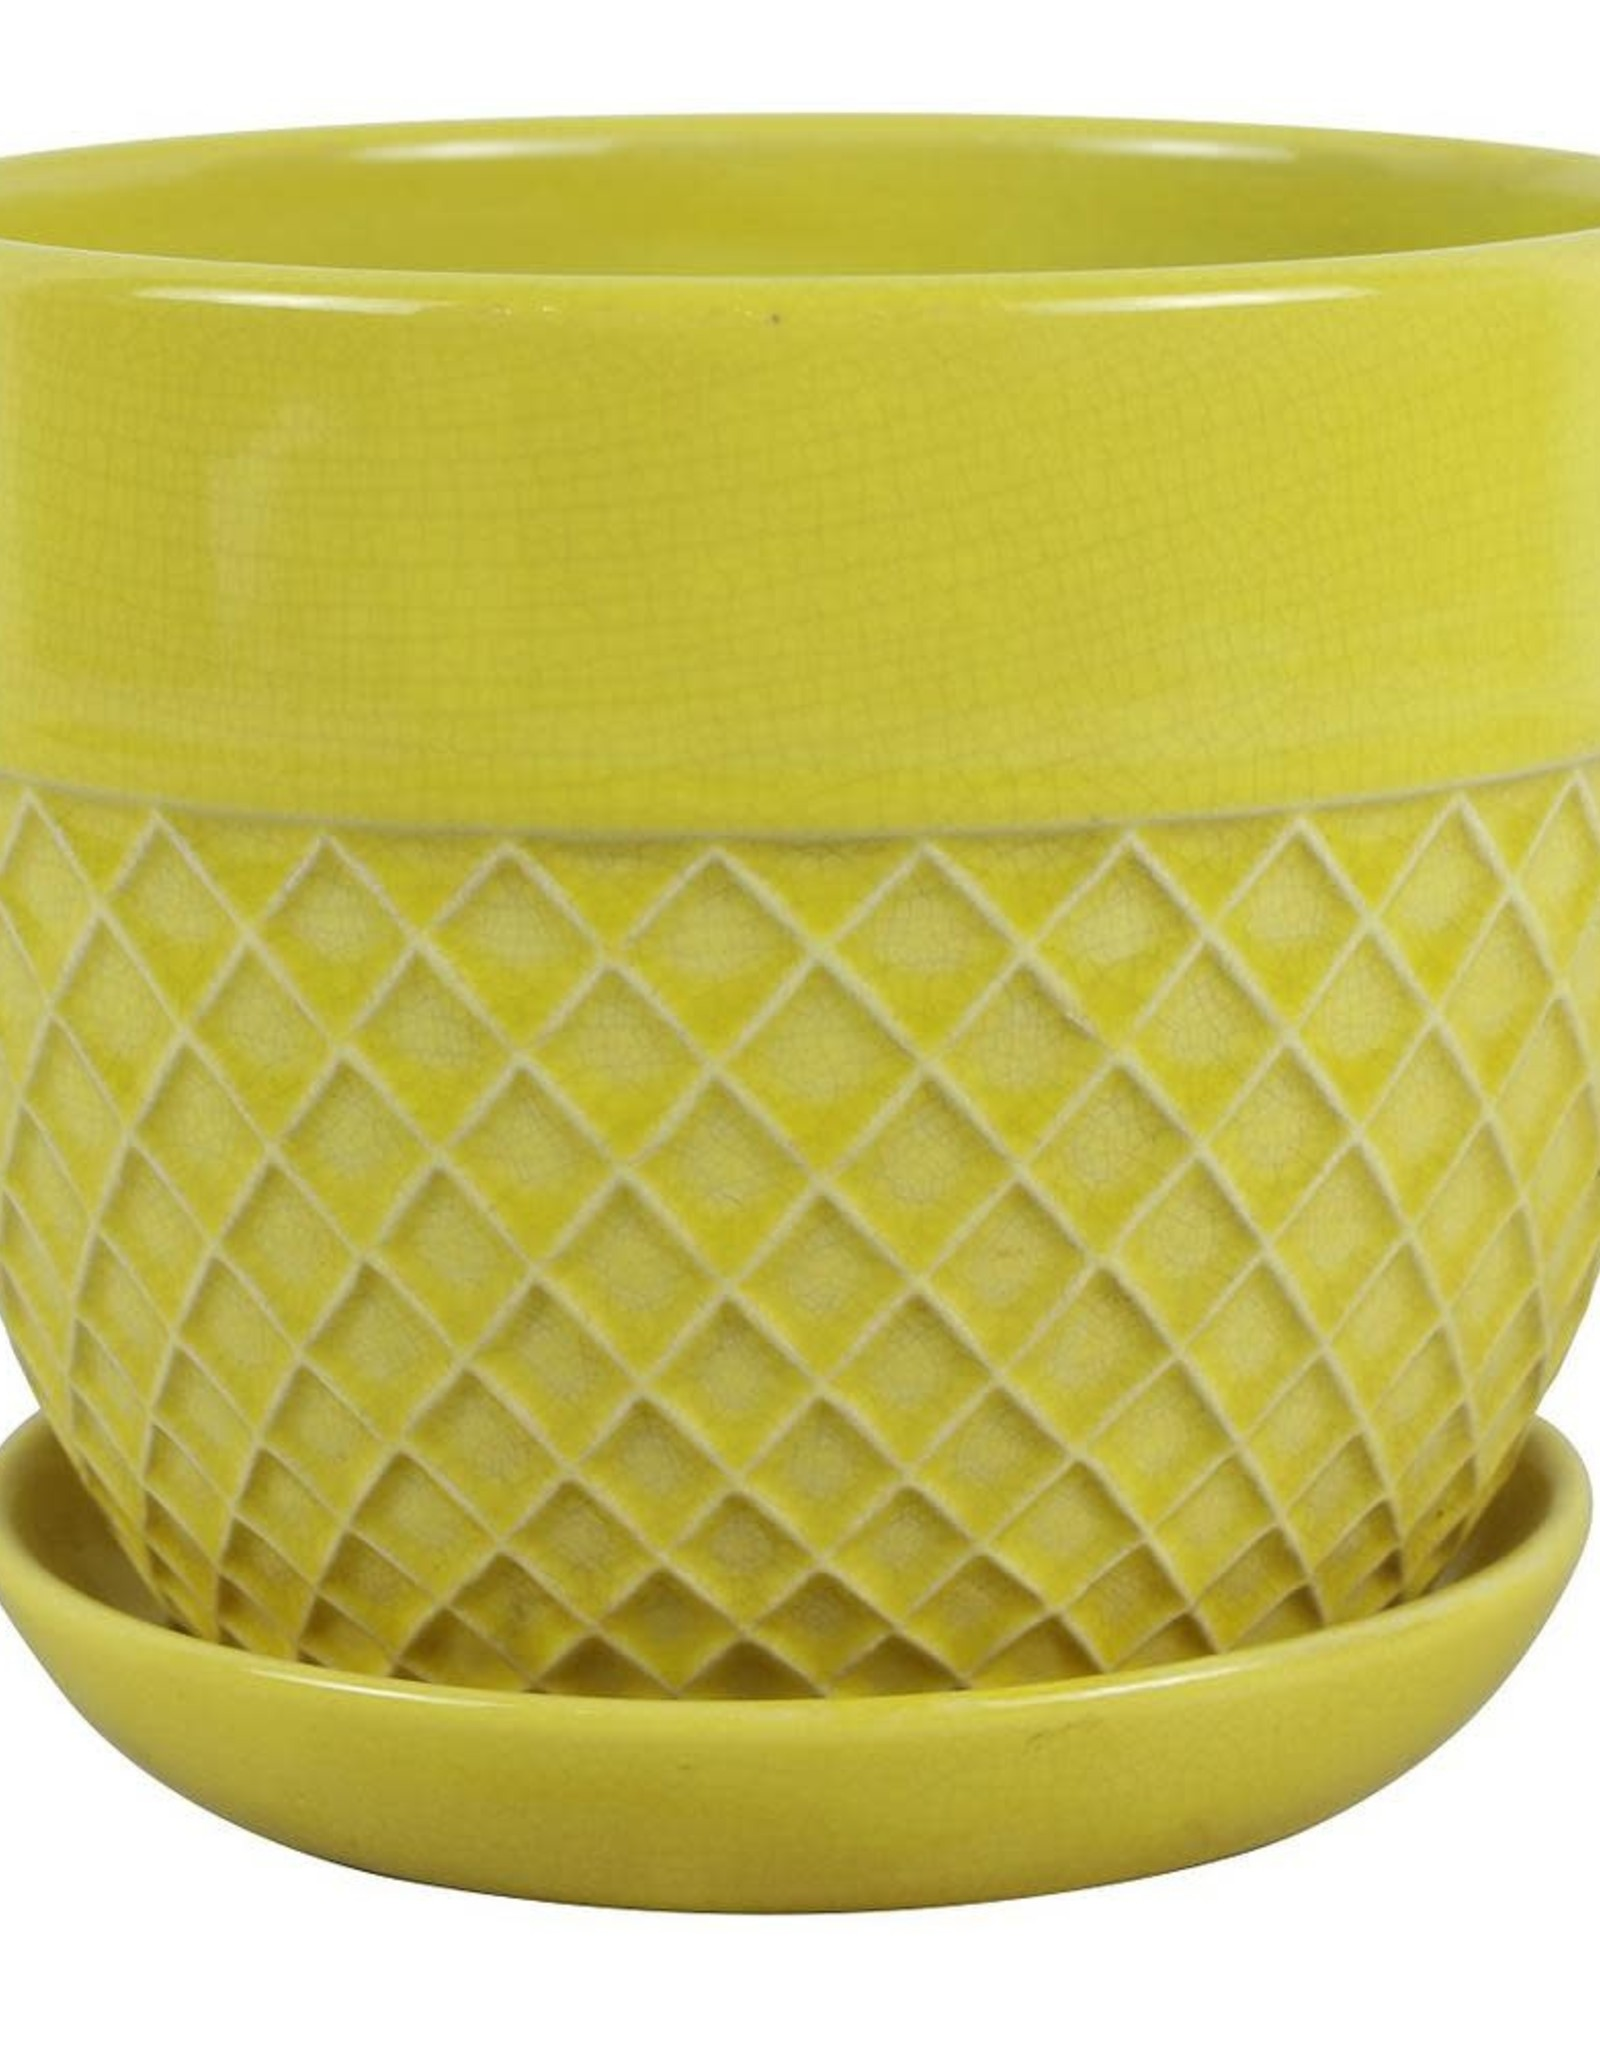 Trendspot 6 in. Dia Yellow Acorn Bell Ceramic Planter